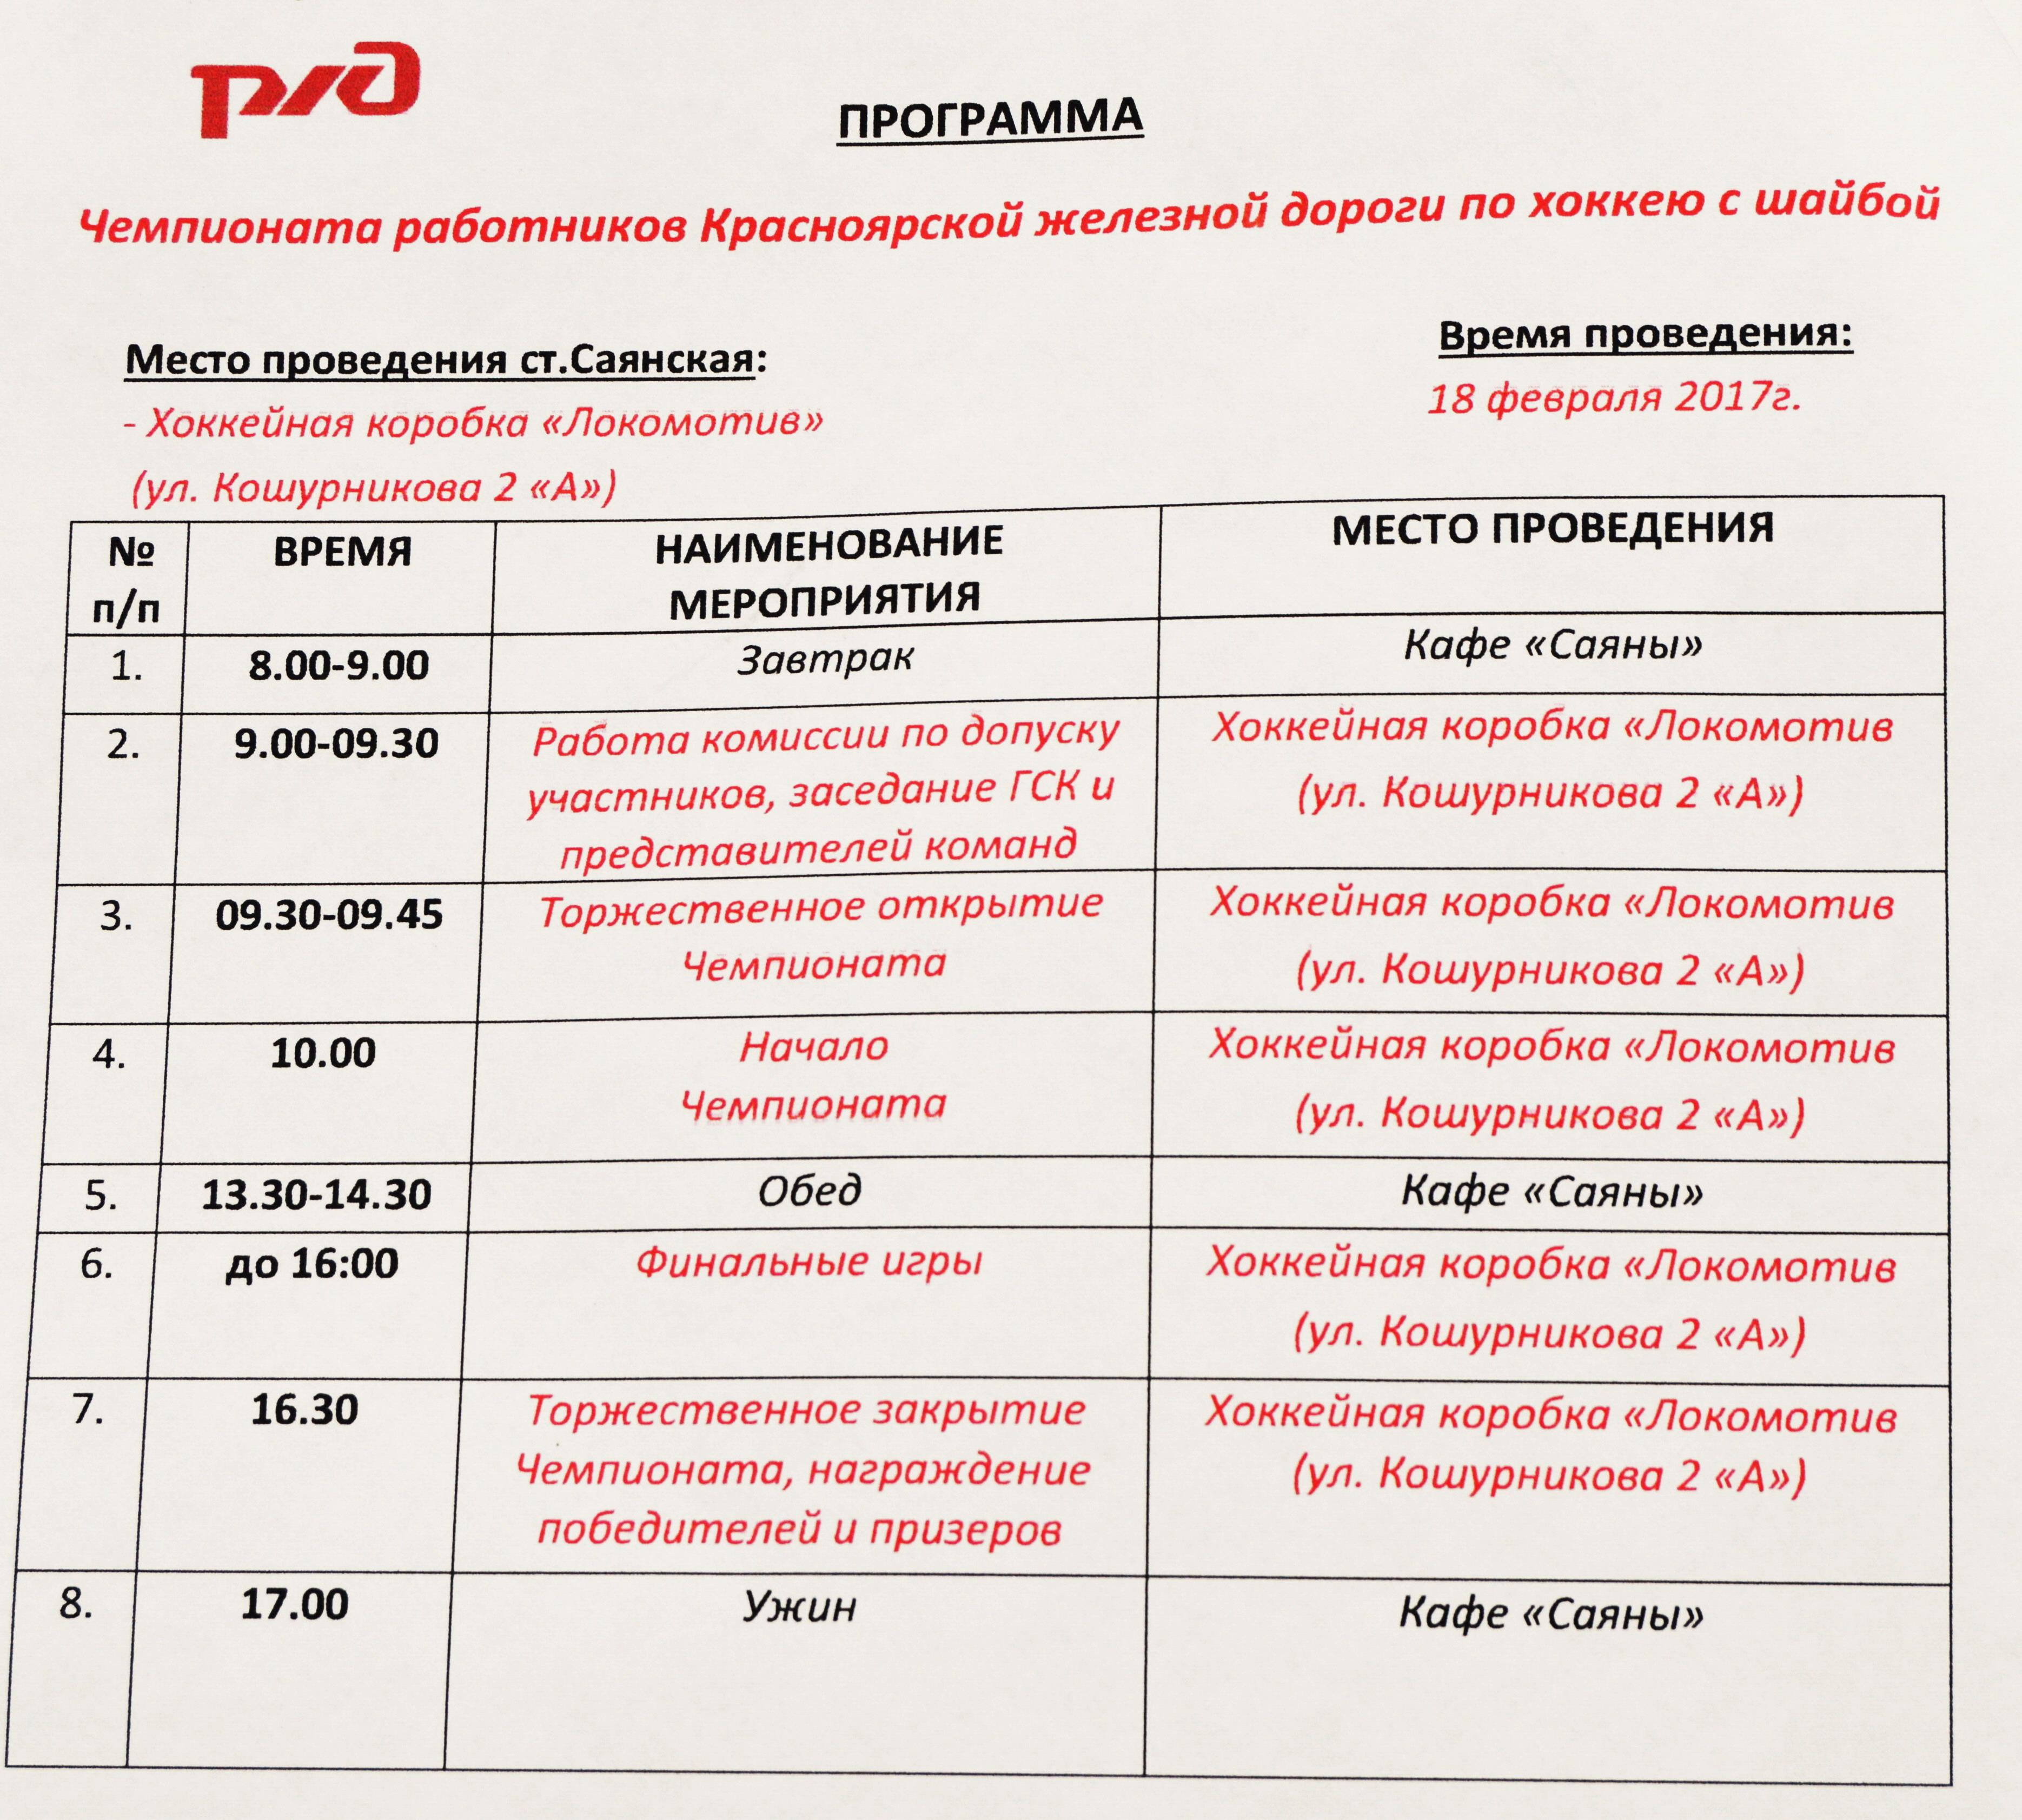 Программа Чемпионата